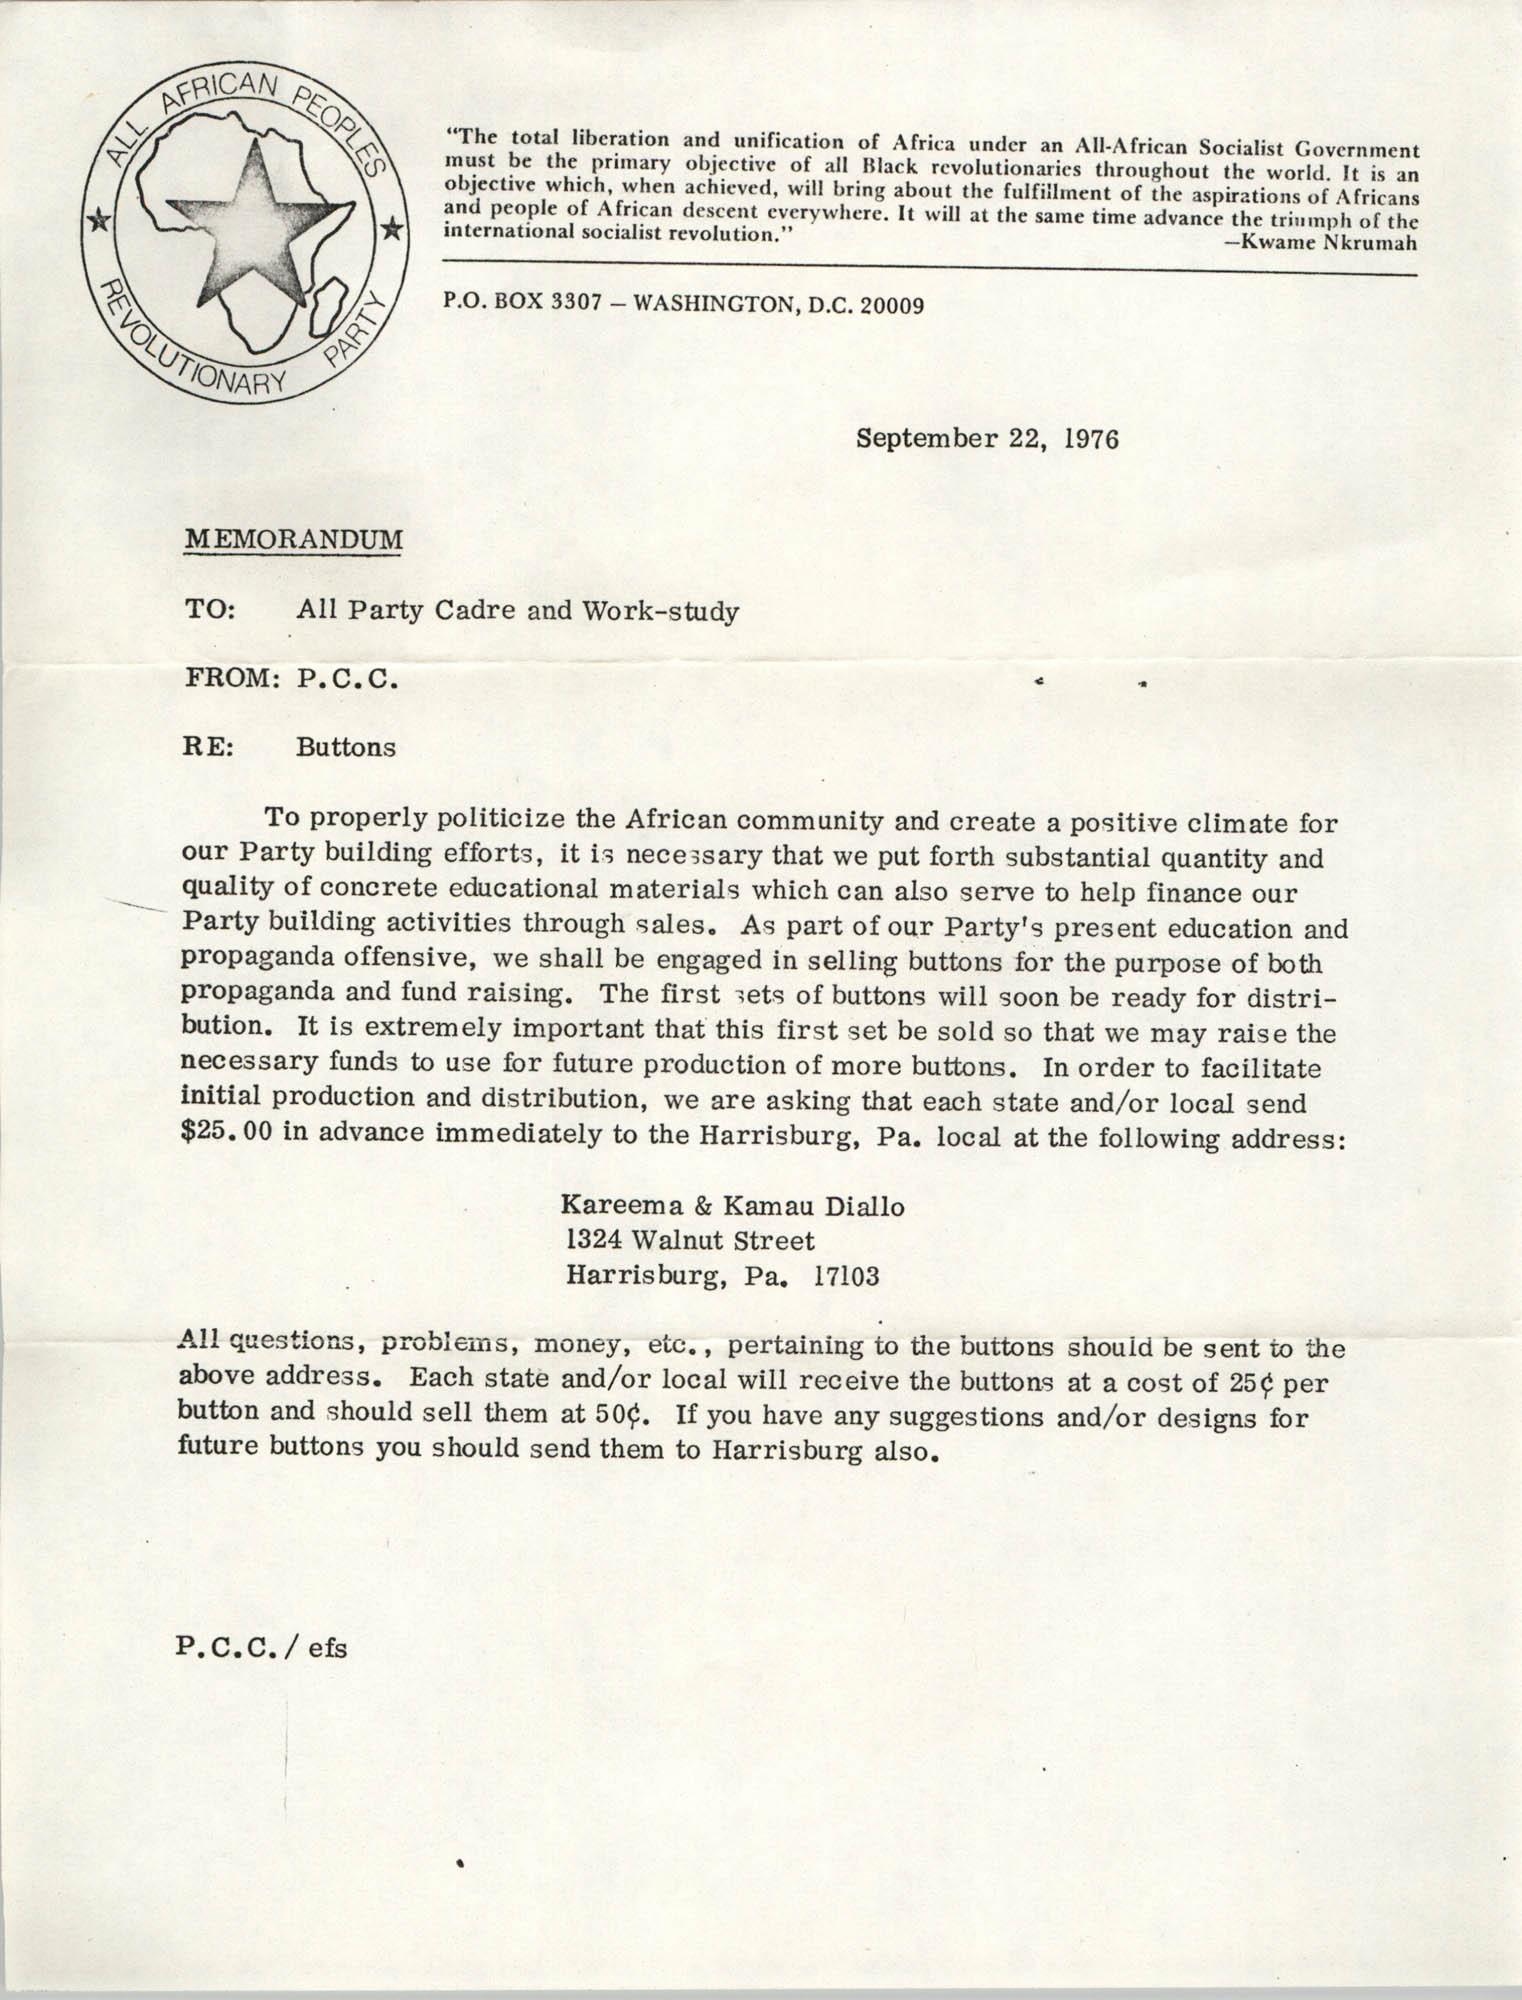 All African People's Revolutionary Party Memorandum, September 22, 1976